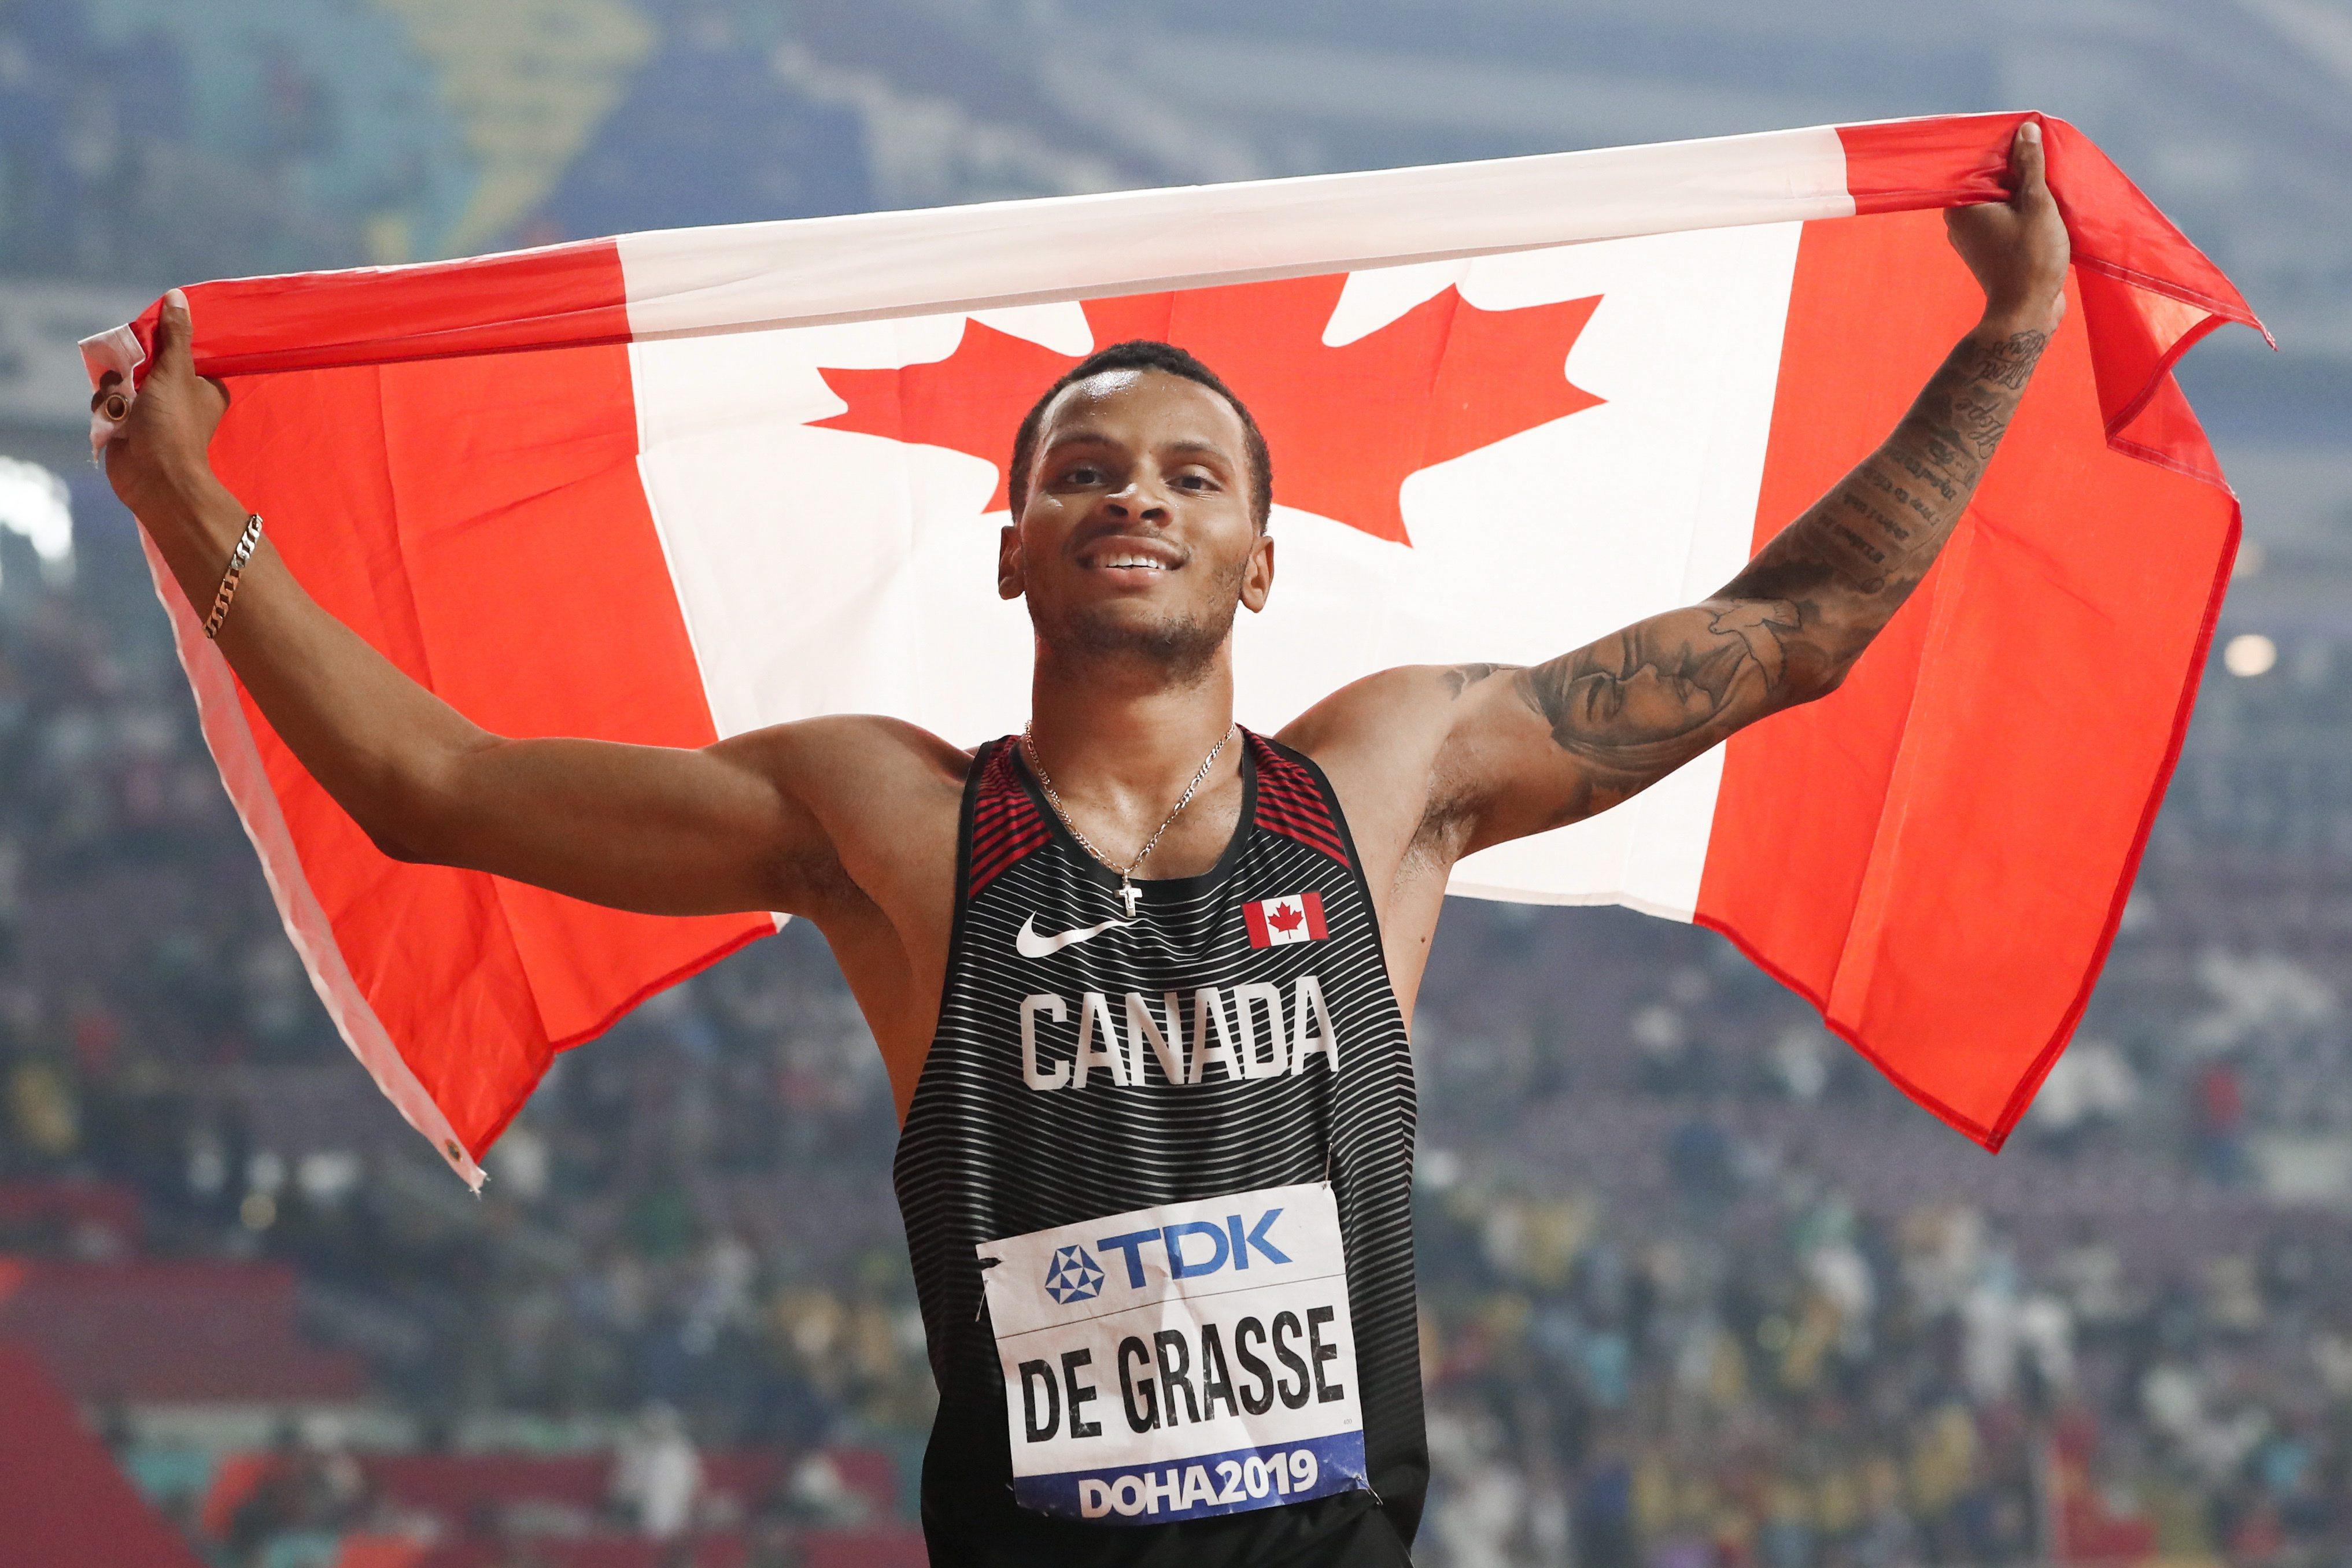 De Grasse holding Canadian flag above head smiling